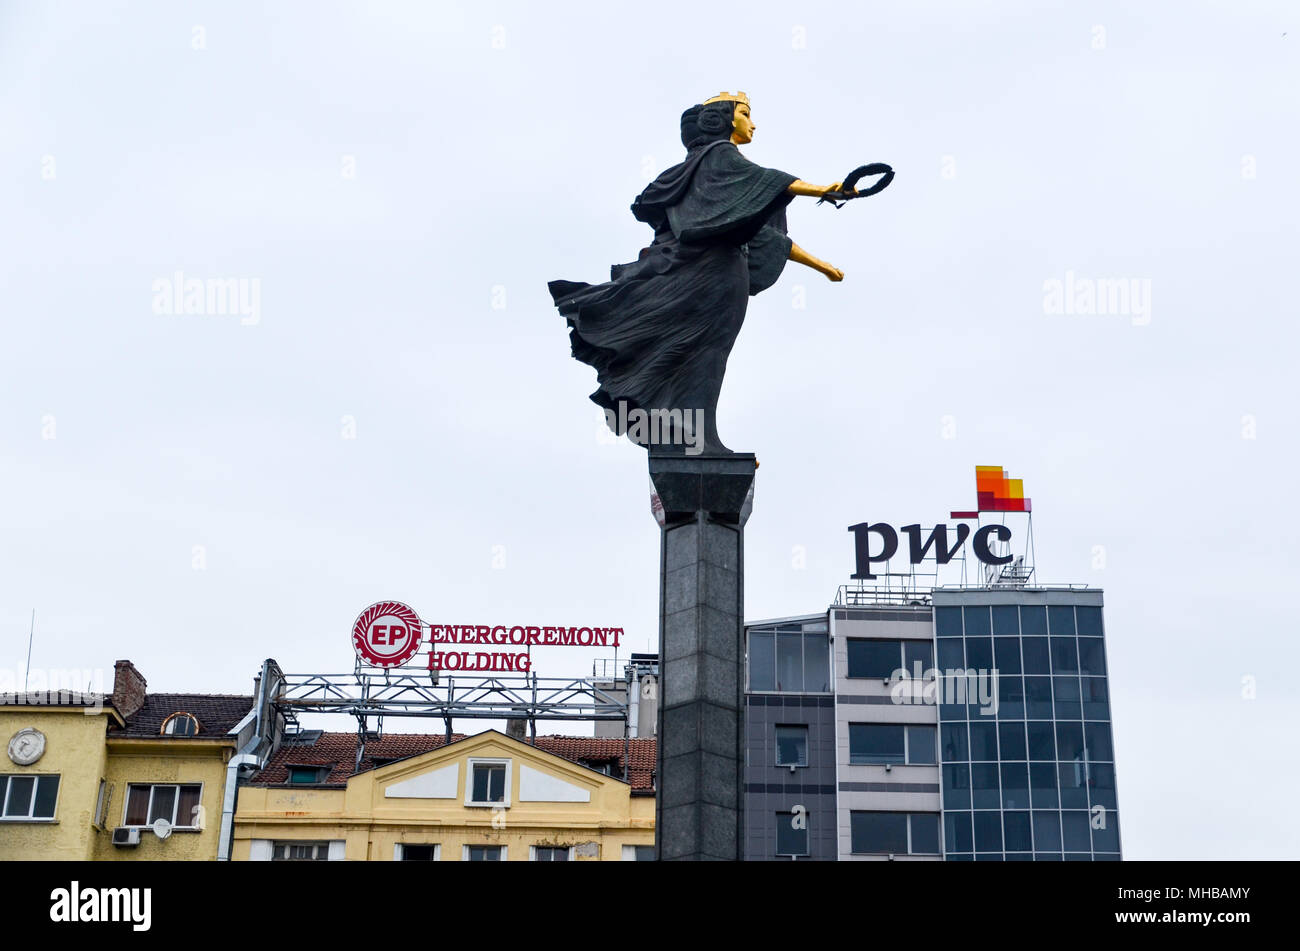 Sveta Sofia statue in Serdika, Sofia, Bulgaria, with the PWC building in the background - Stock Image